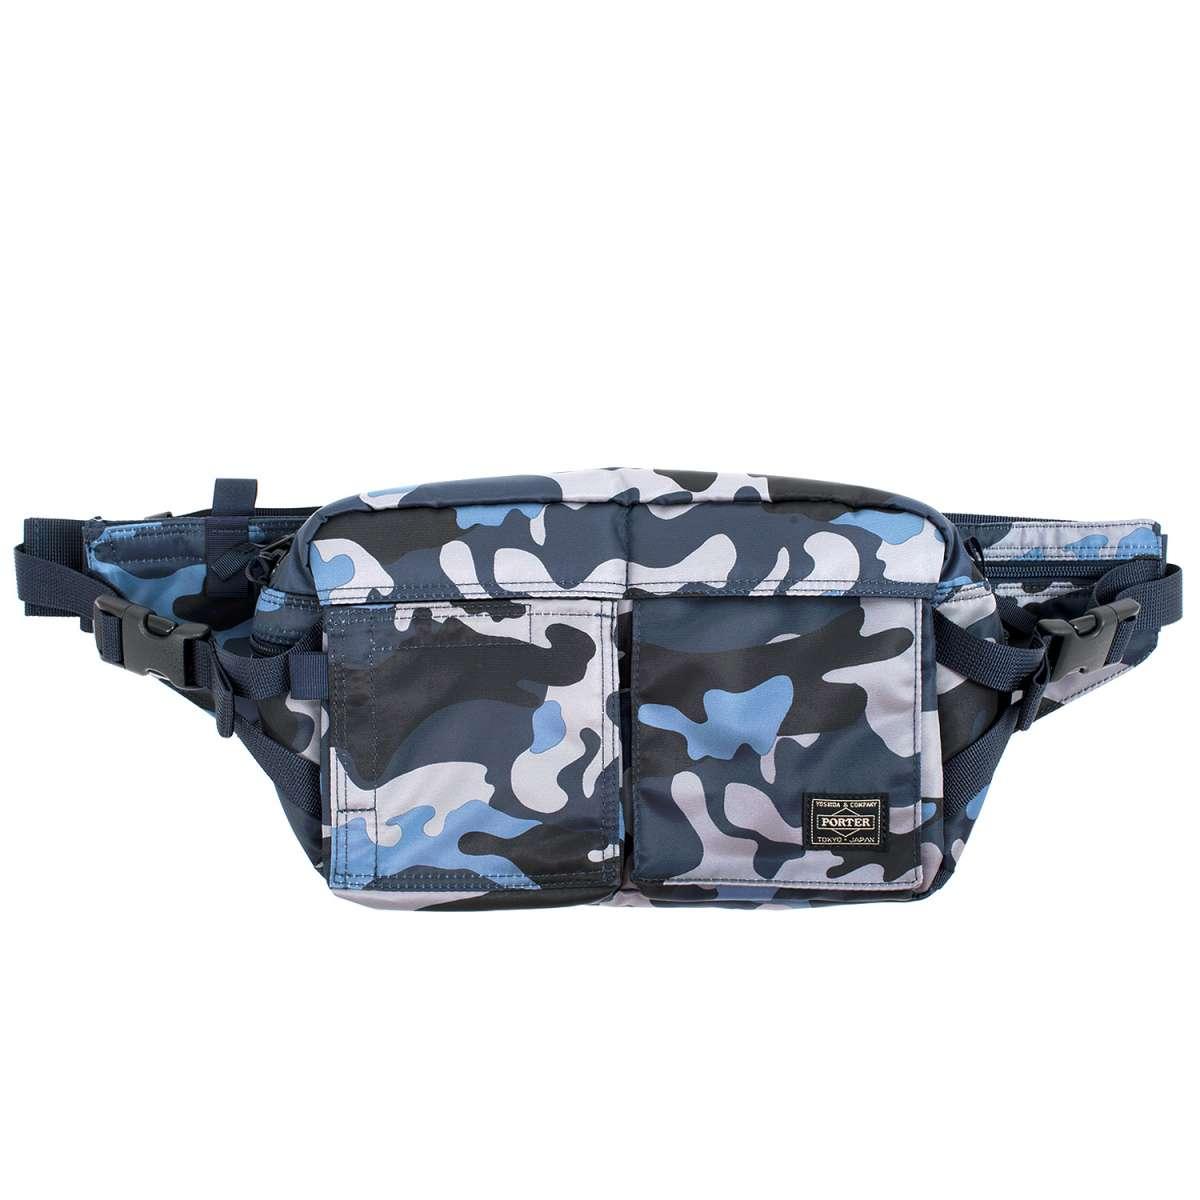 head-porter-jungle-new-waist-bag-01_600x600@2x